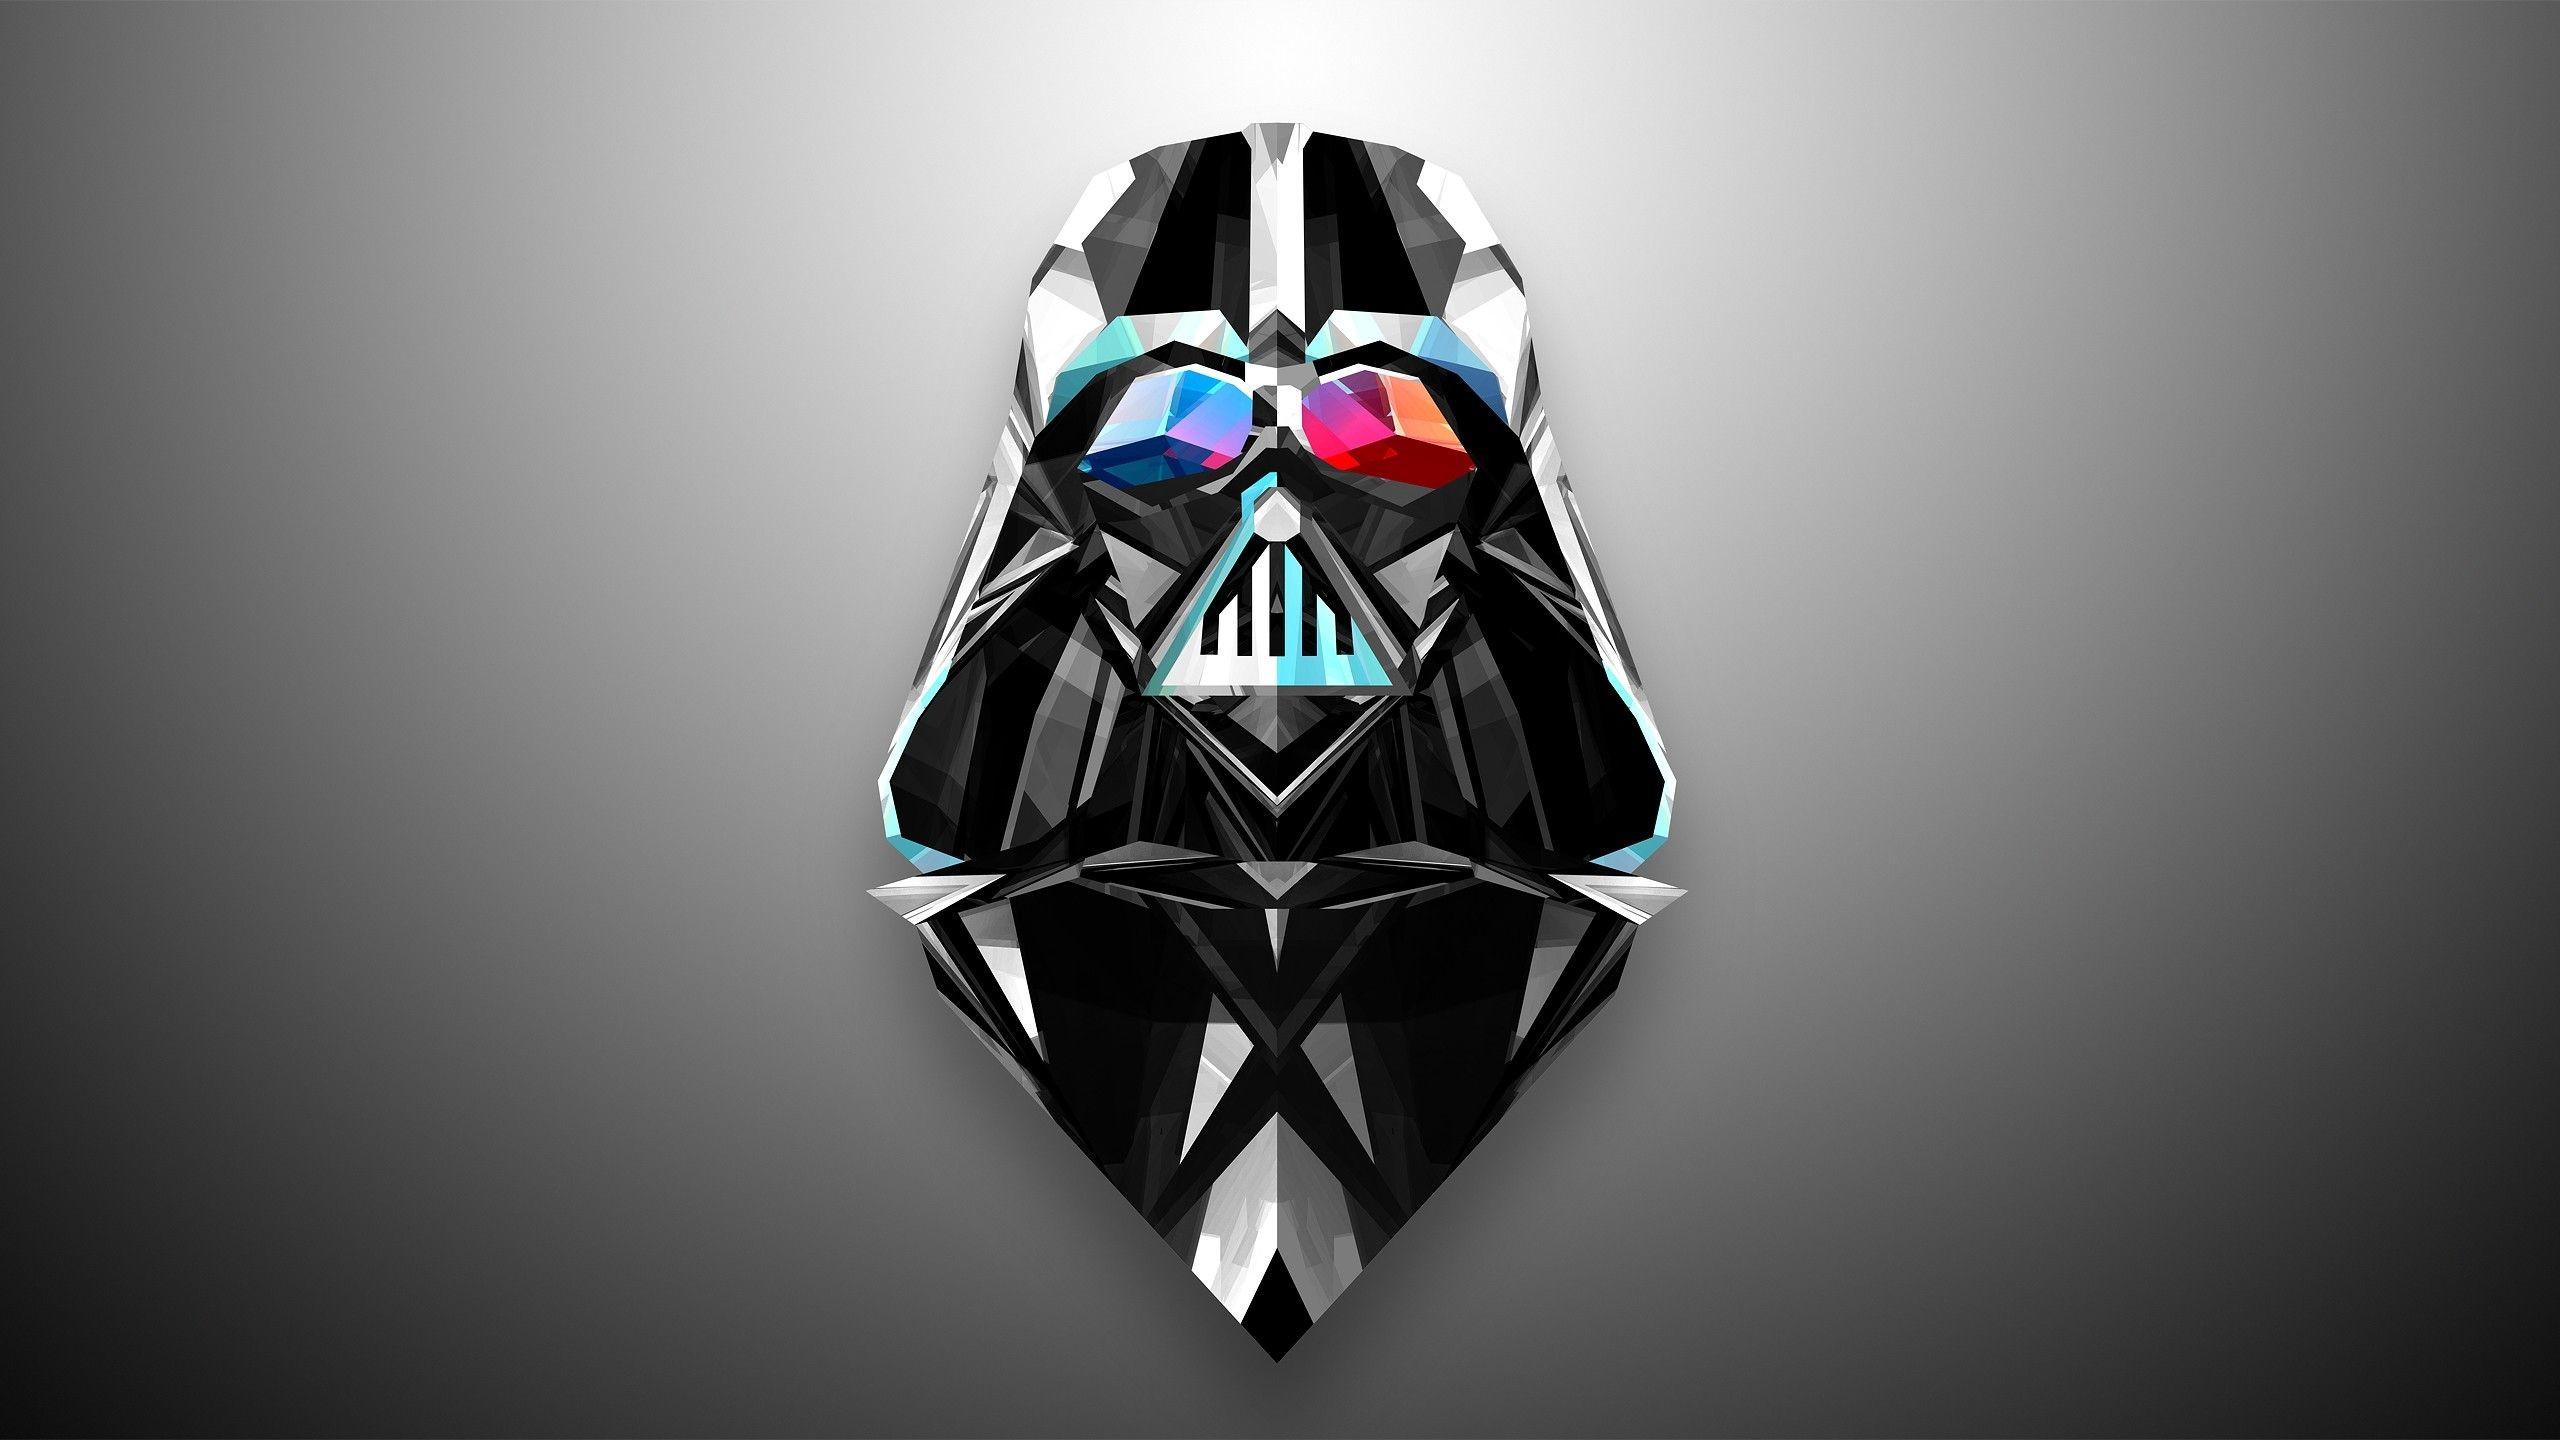 Star Wars Darth Vader Full HD Ravishing Wallpaper Free HD .